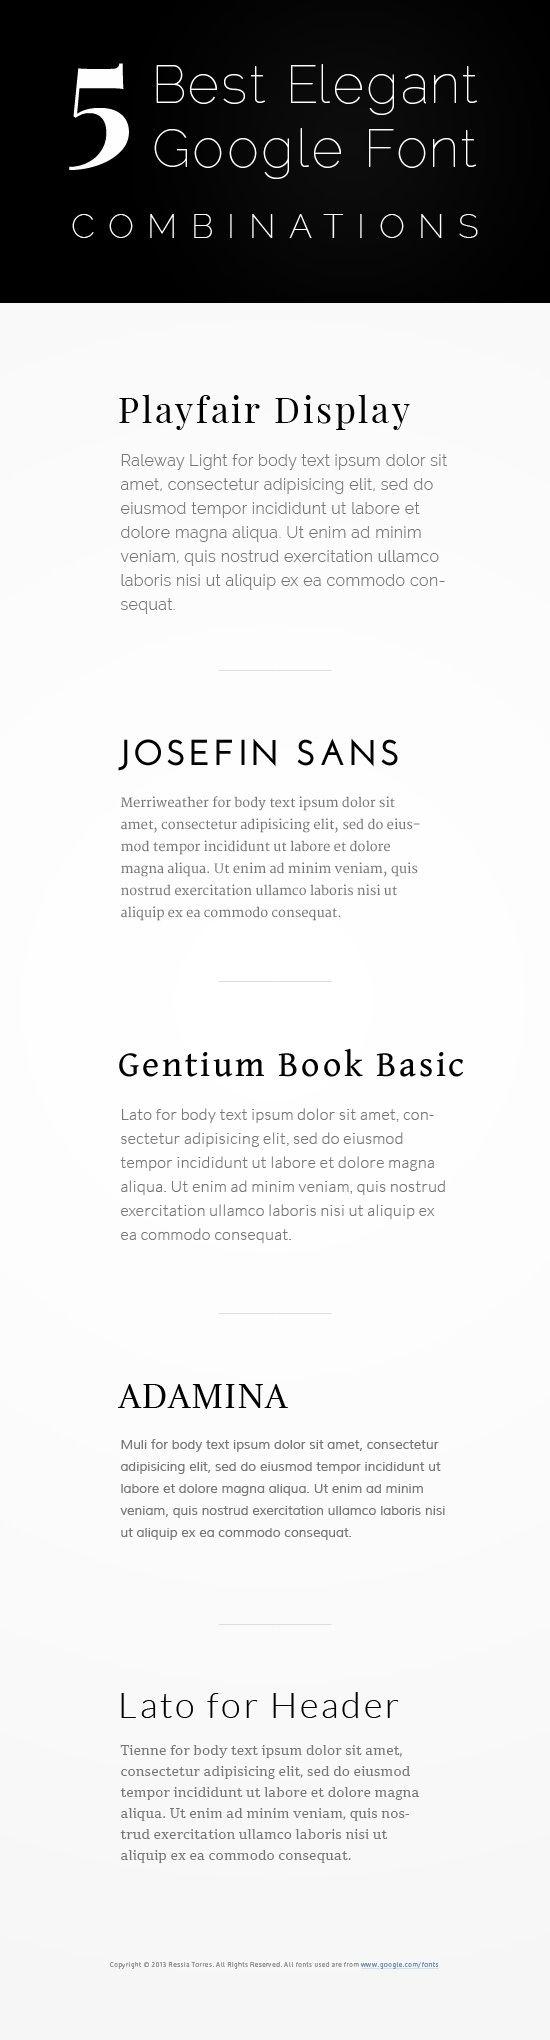 basic gentium google fontss book